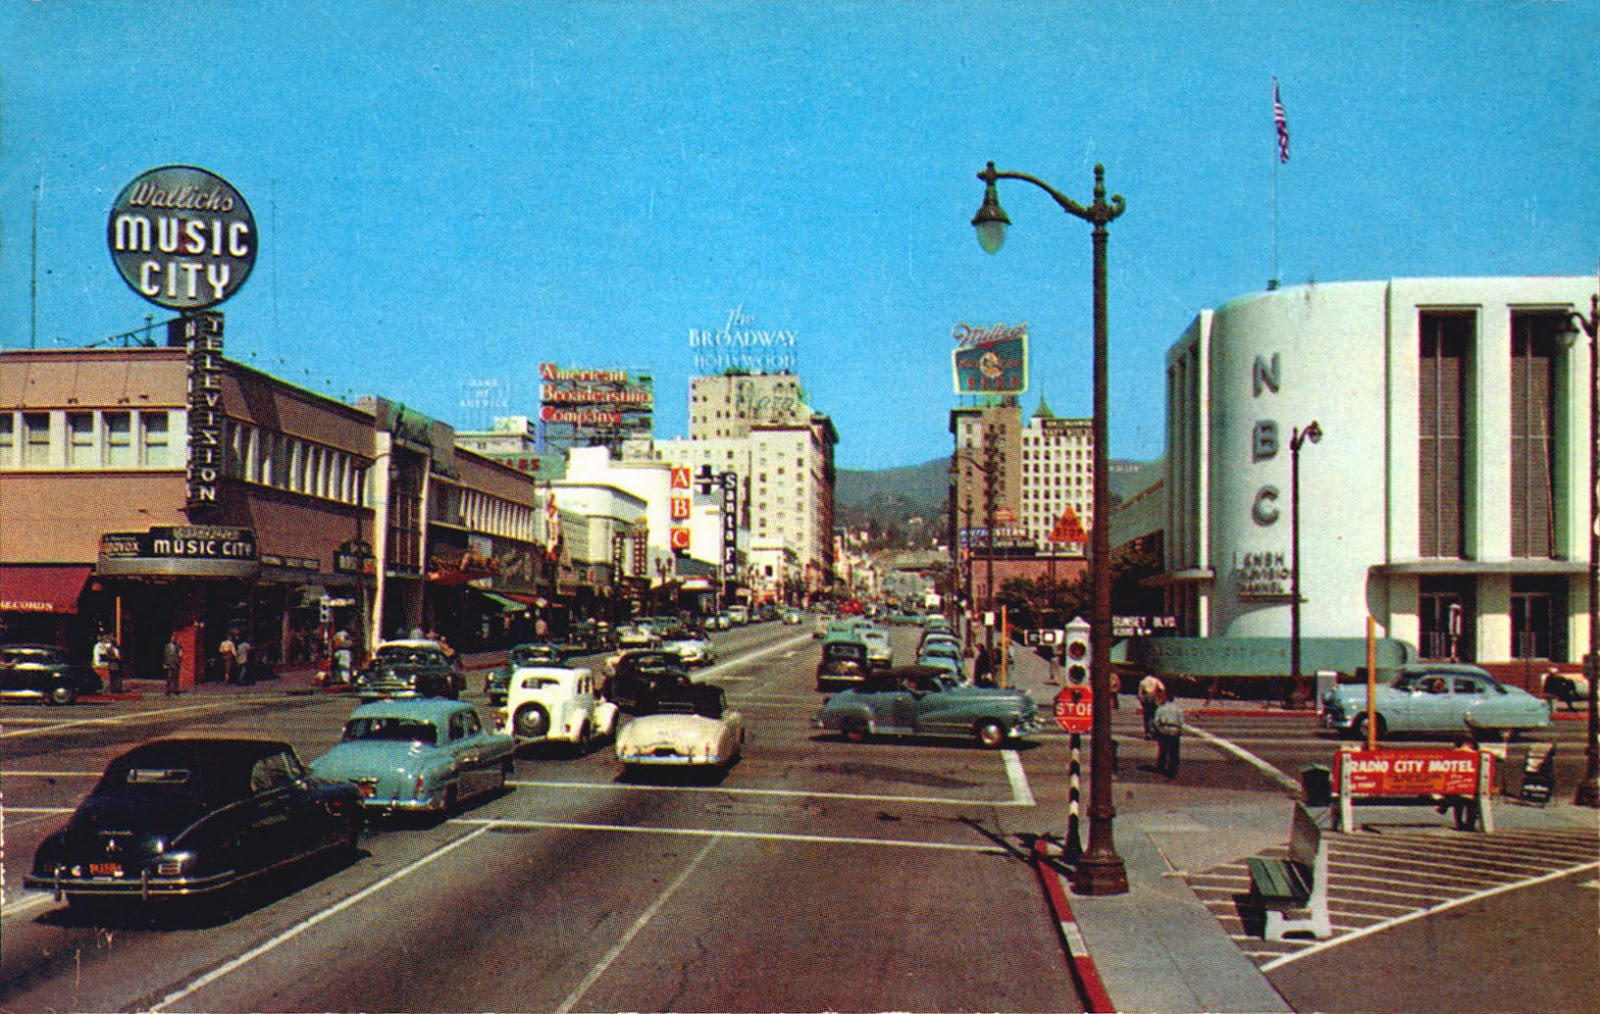 Sunset Vine 1950s Wallick S Music City